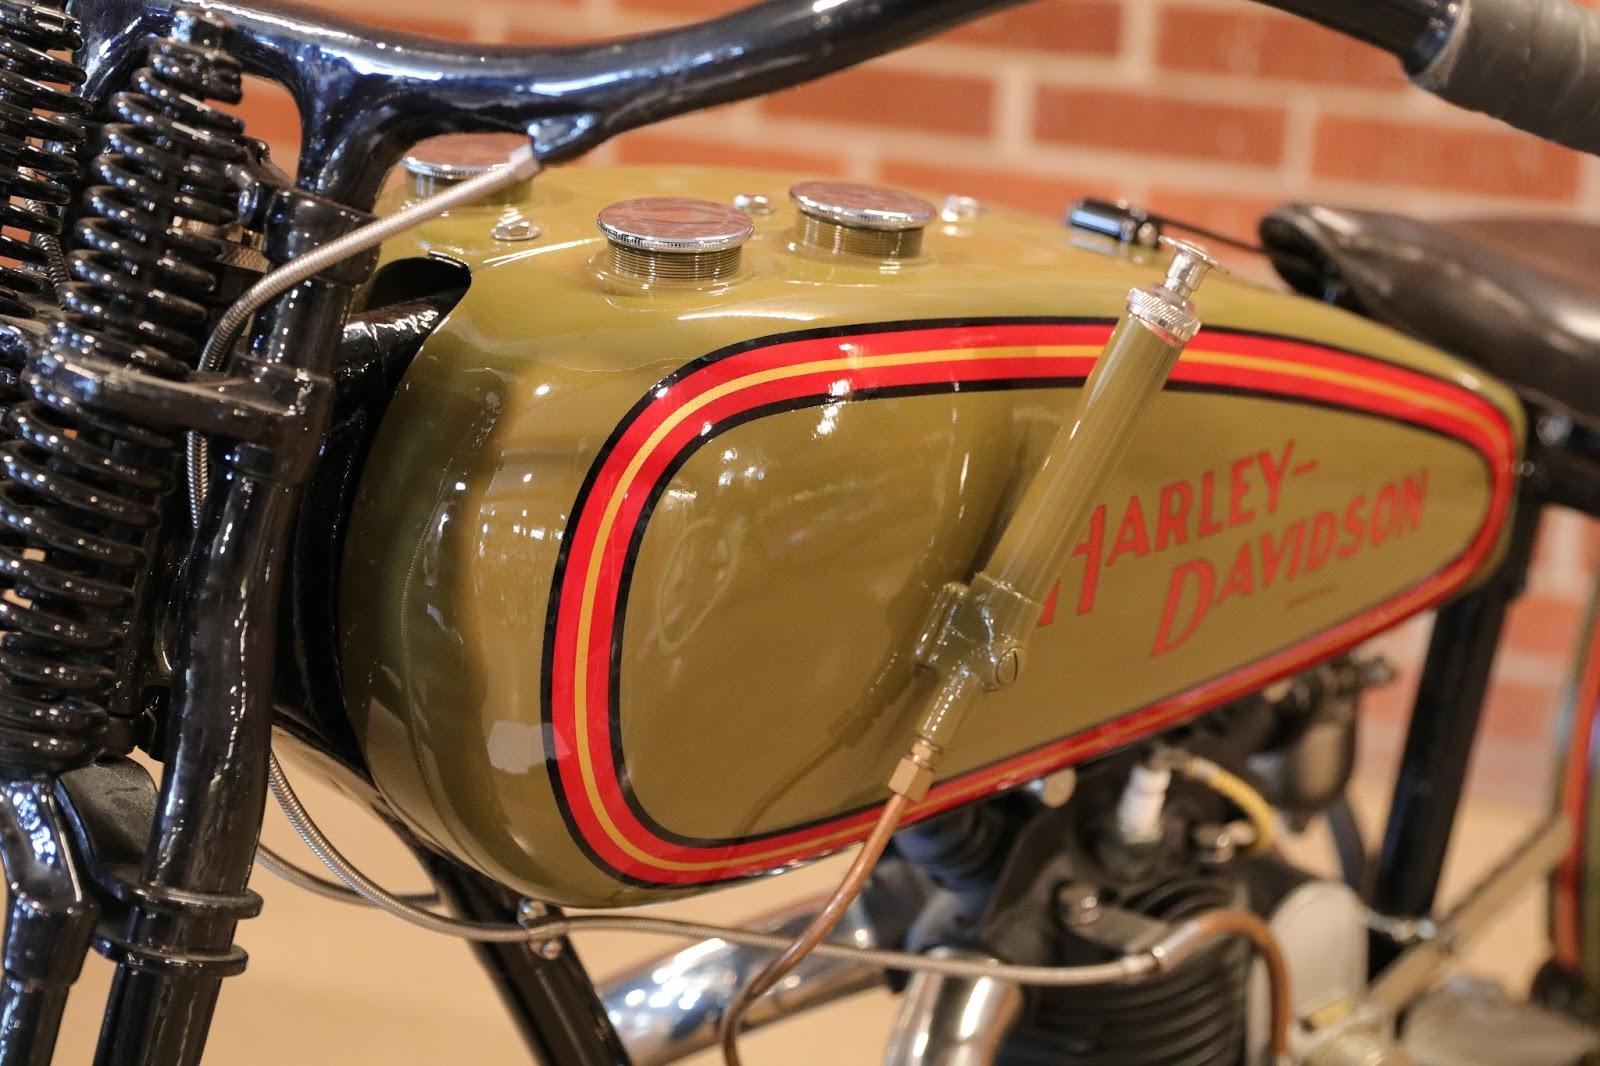 Harley Davidson: OldMotoDude: 1928 Harley-Davidson Peashooter Hill Climber